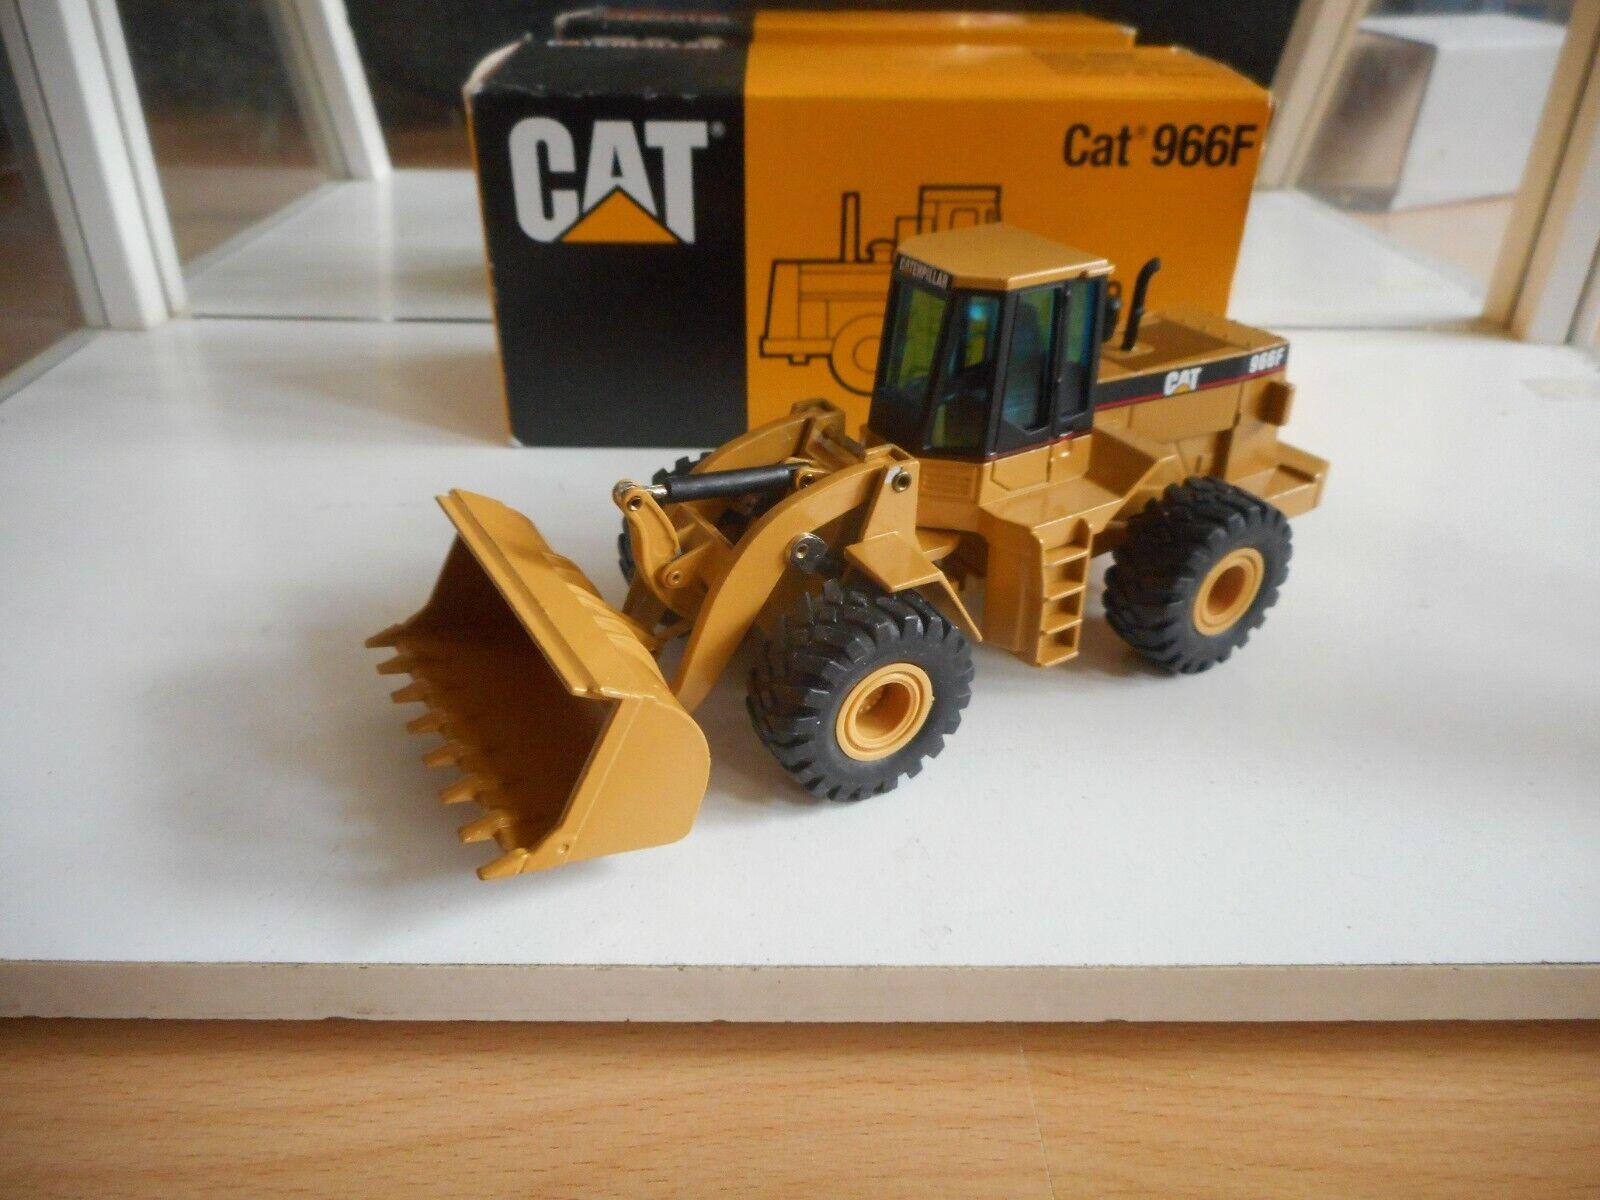 NZG Caterpillar Cat 966F Wheel Loader in Yellow on 1 50 in Box